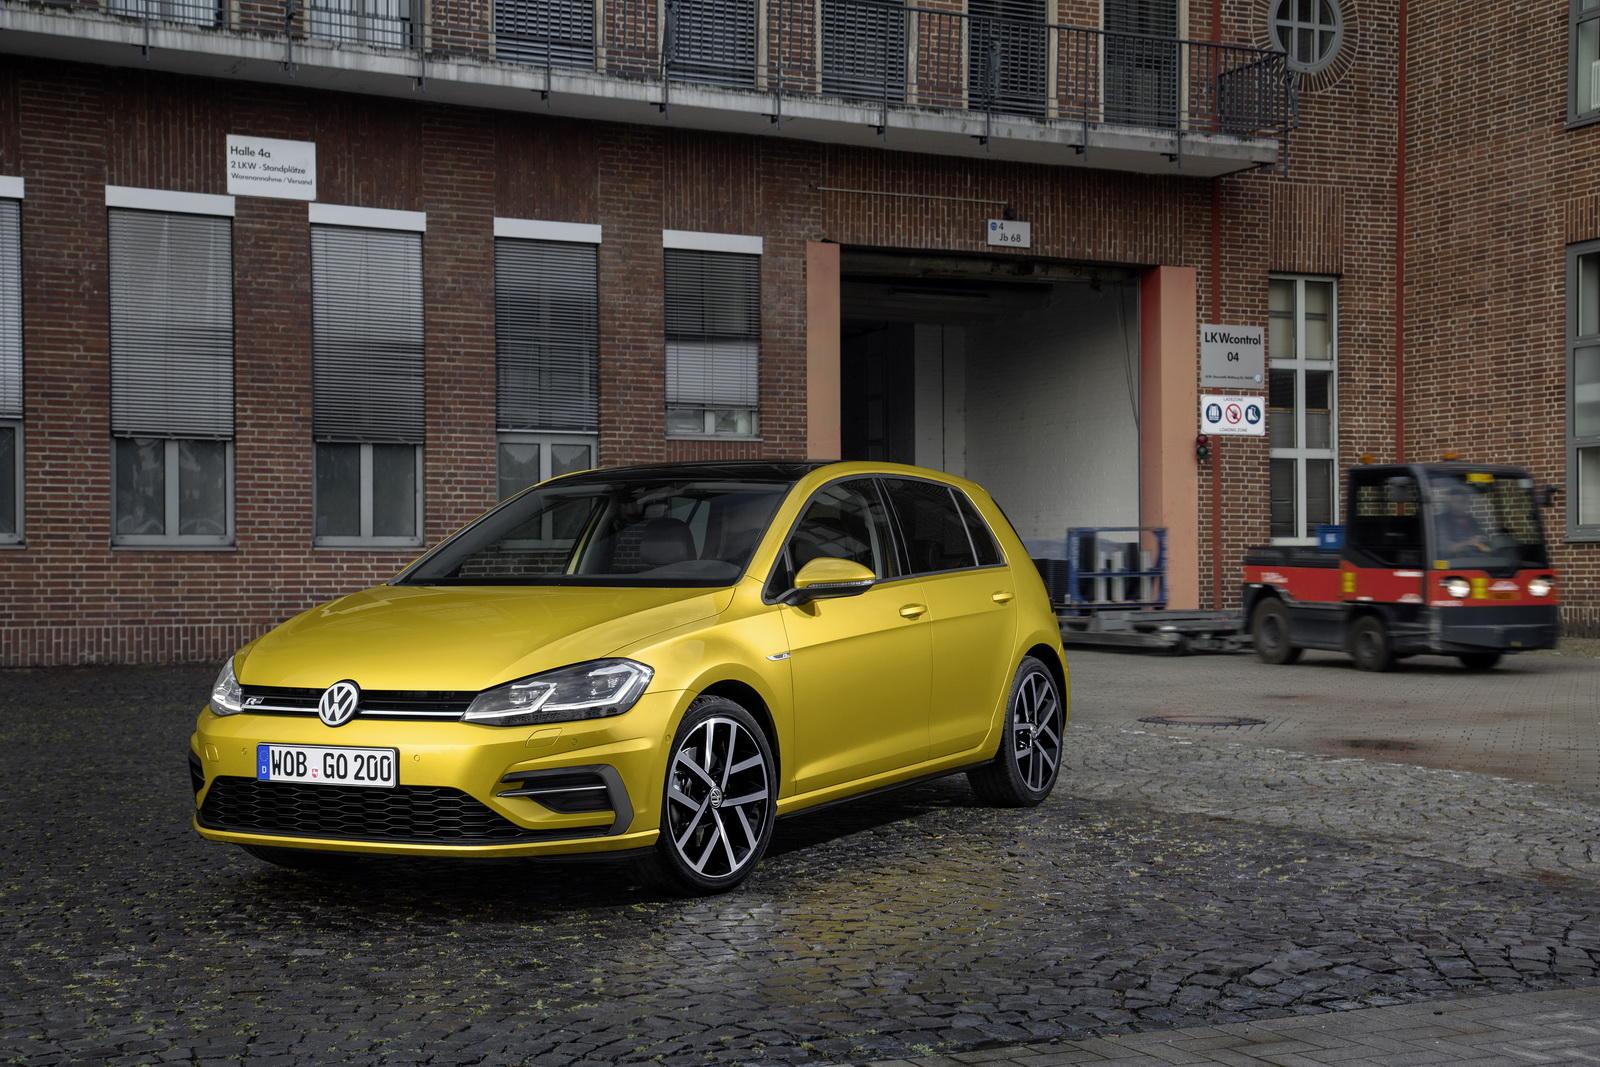 Volkswagen Golf 1.5 TSI ACT Bluemotion - Volkswagen Golf 1.5 TSI ACT Bluemotion